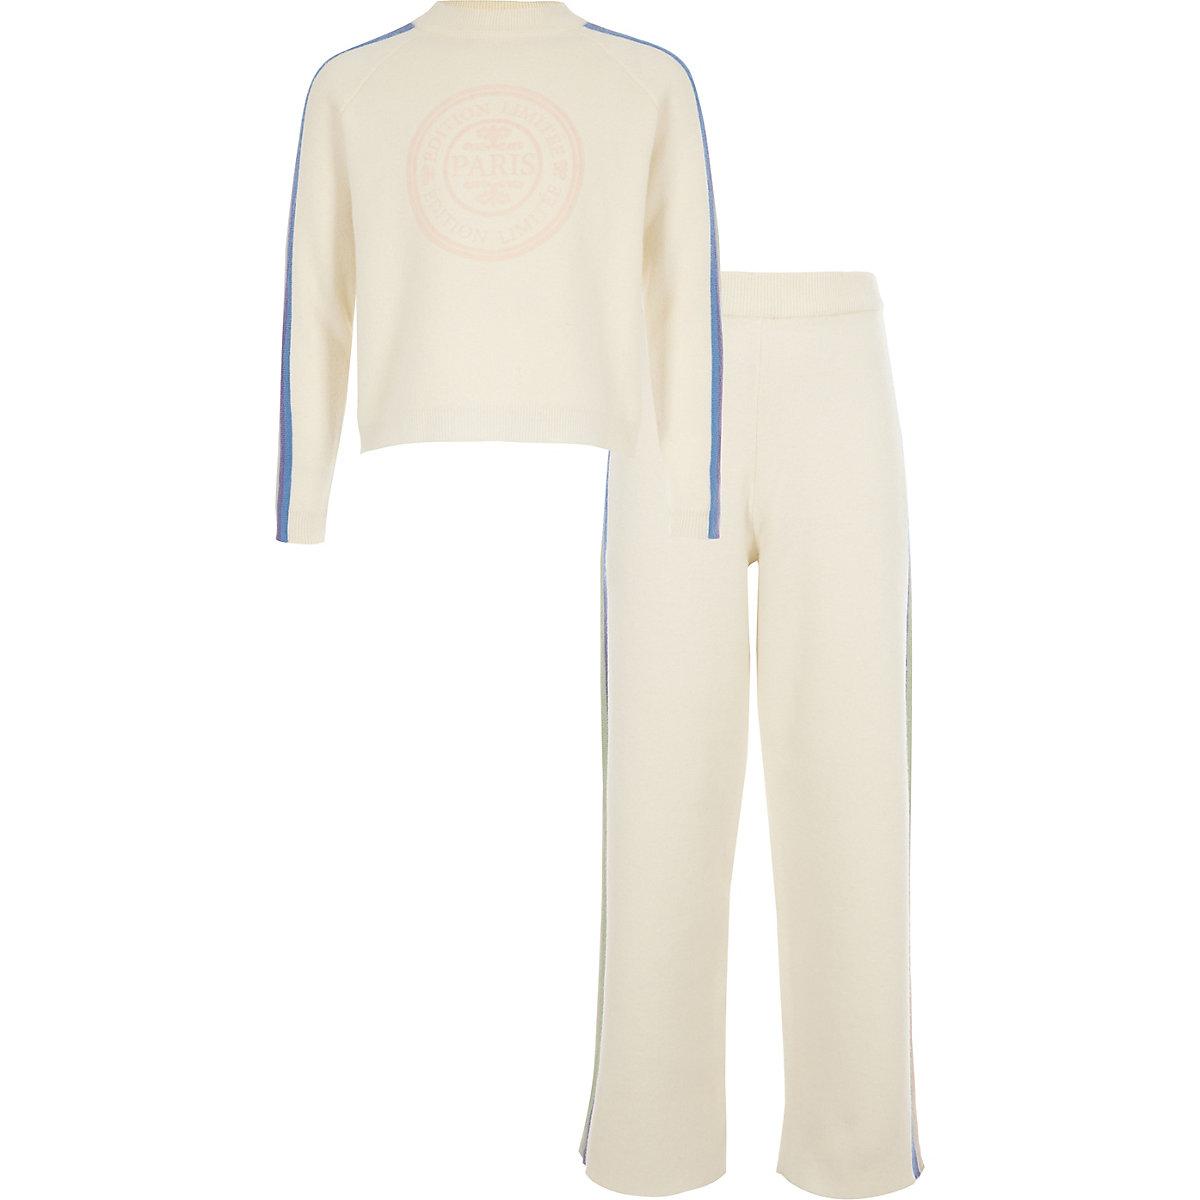 Girls cream rainbow stripe jumper outfit